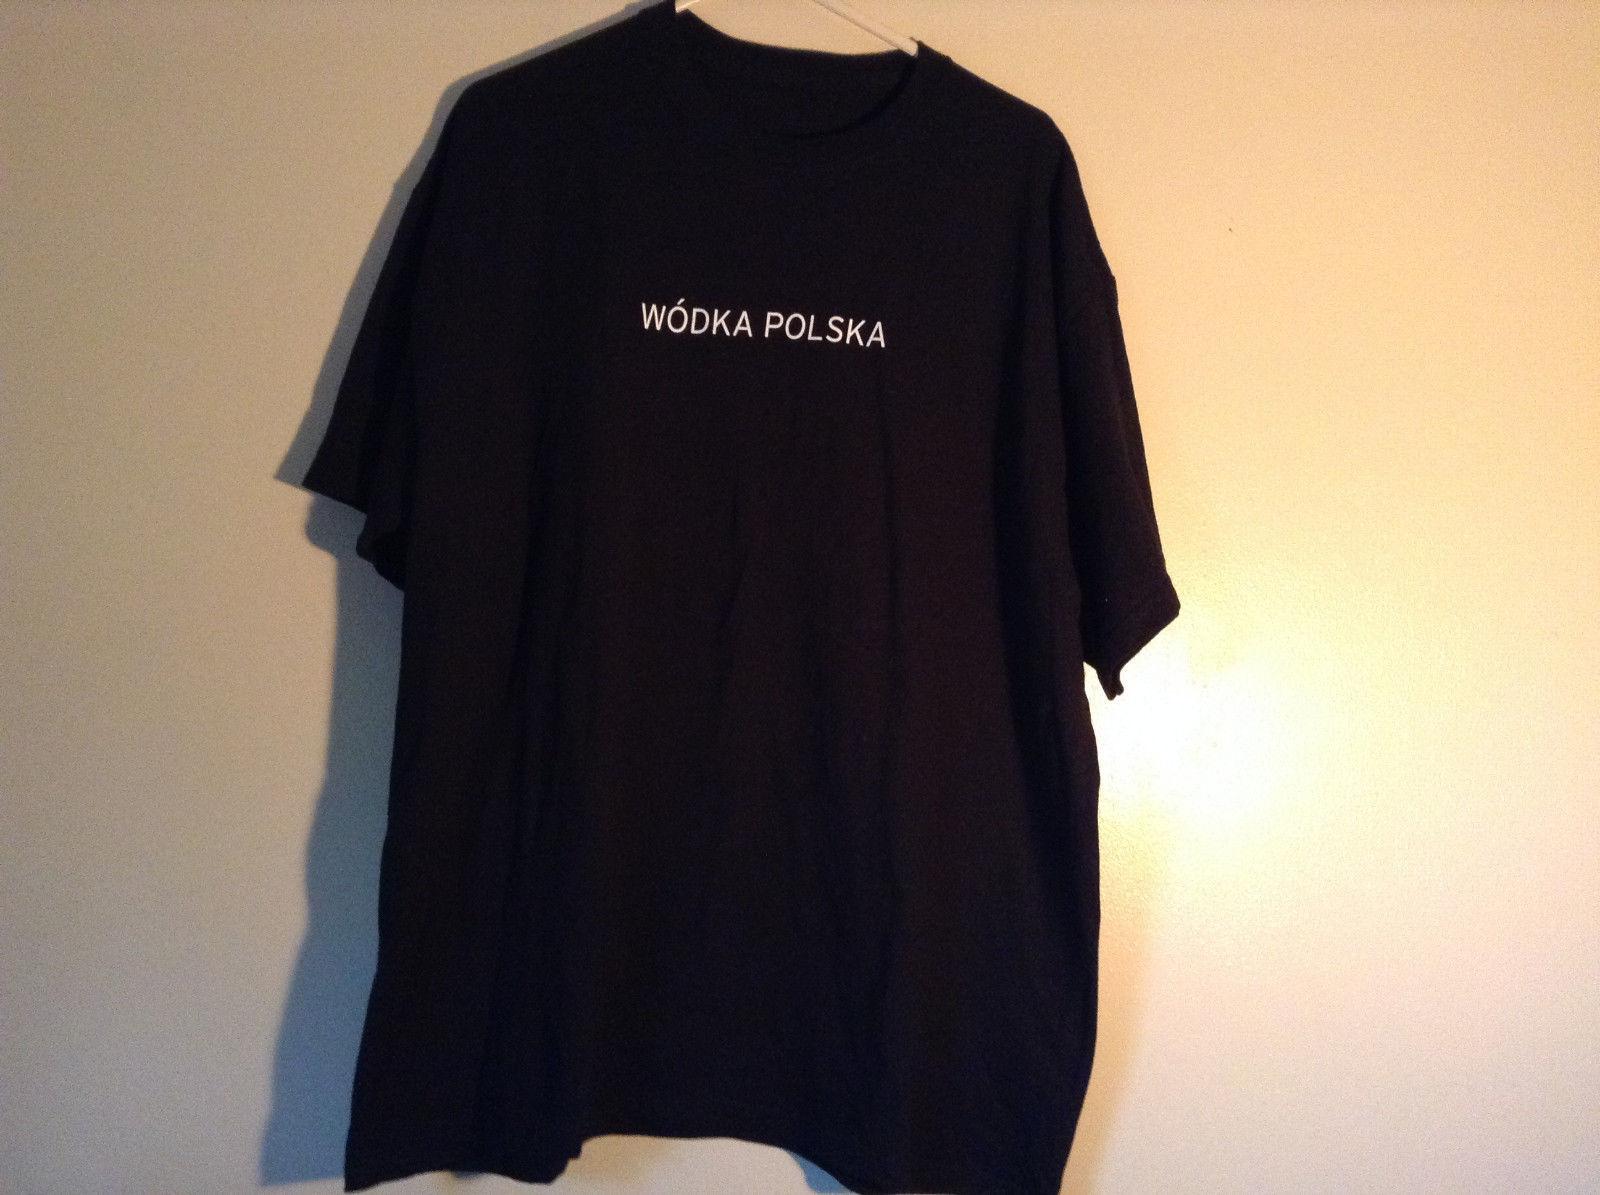 Black Short Sleeve T Shirt Wo dka Polska on Front Sobieski Vodka on Back NO TAG